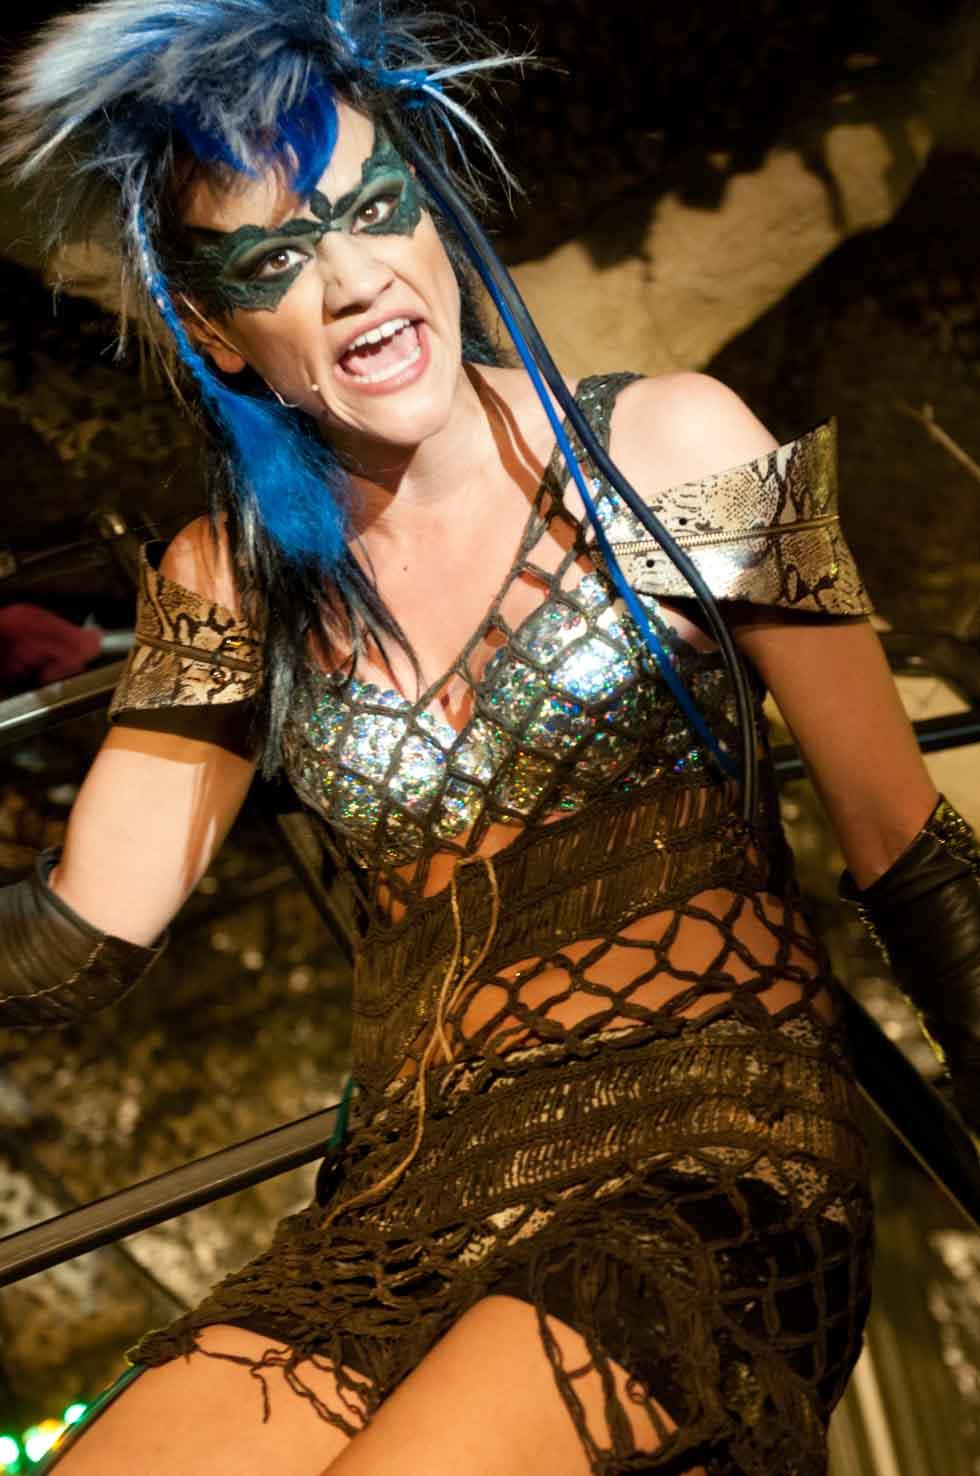 zum-schneider-nyc-2012-karneval-apocalyptika-4951.jpg